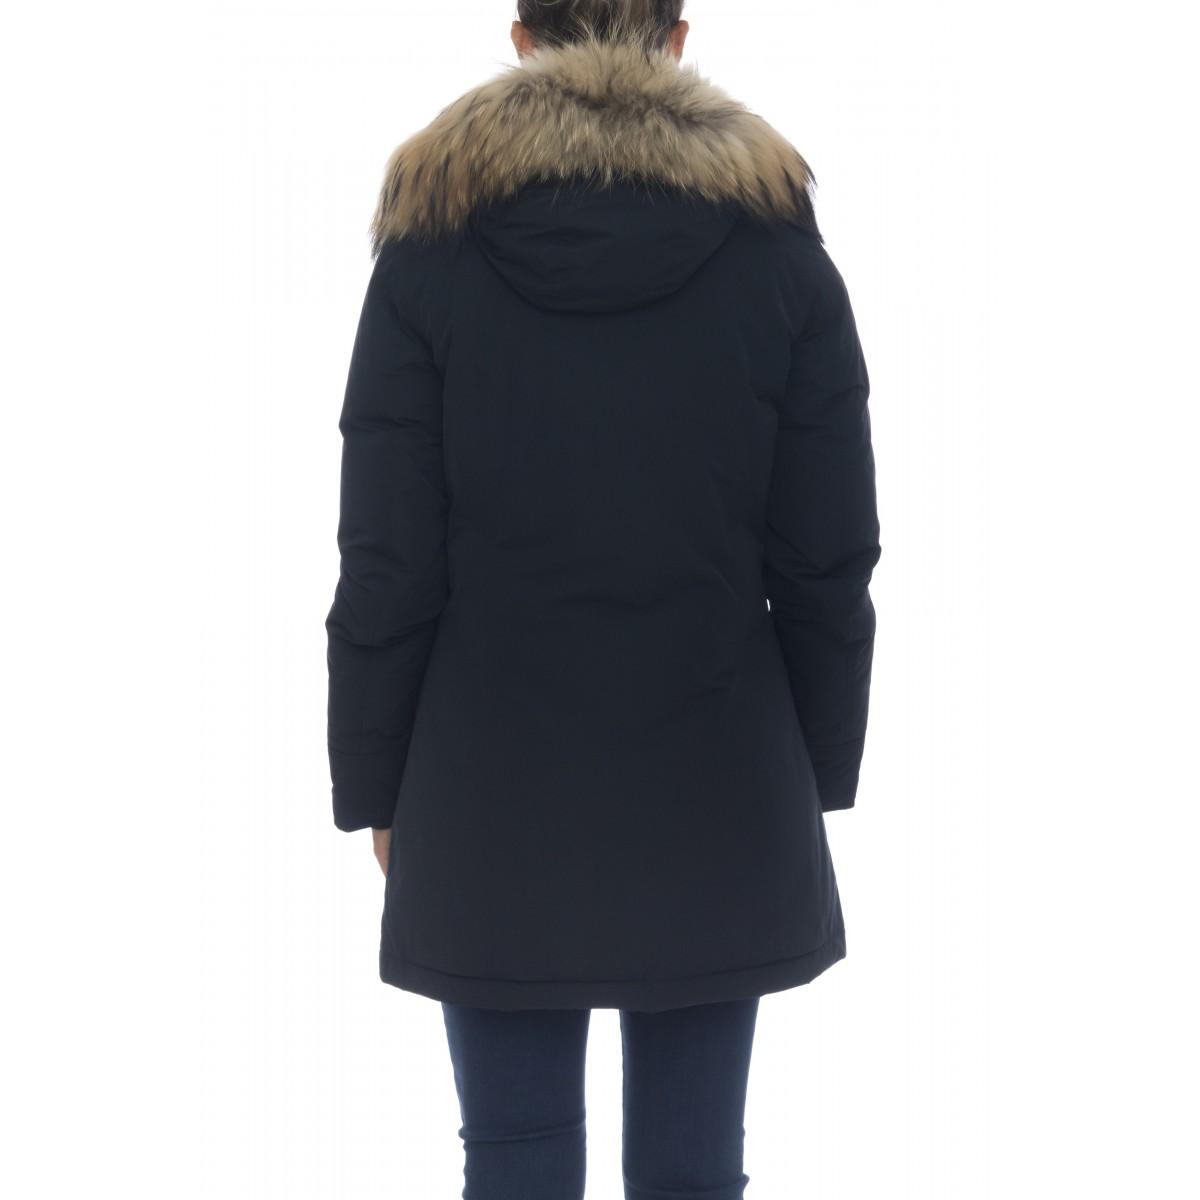 Parka Woman - WWOU0296 fr luxury artic parka fr